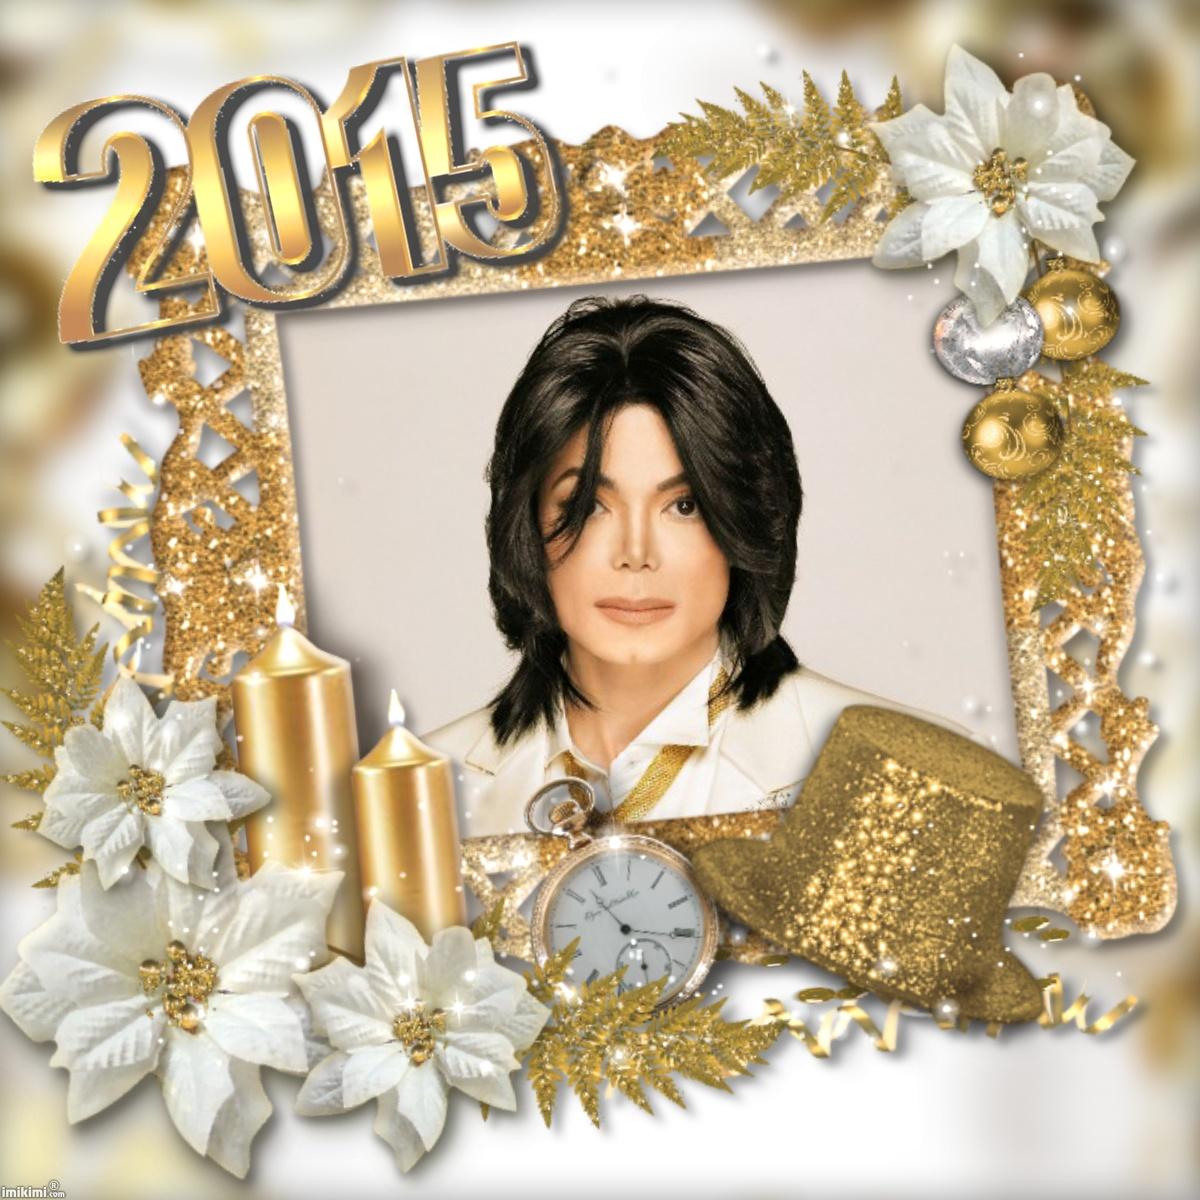 HAPPY NEW YEAR,MICHAEL!